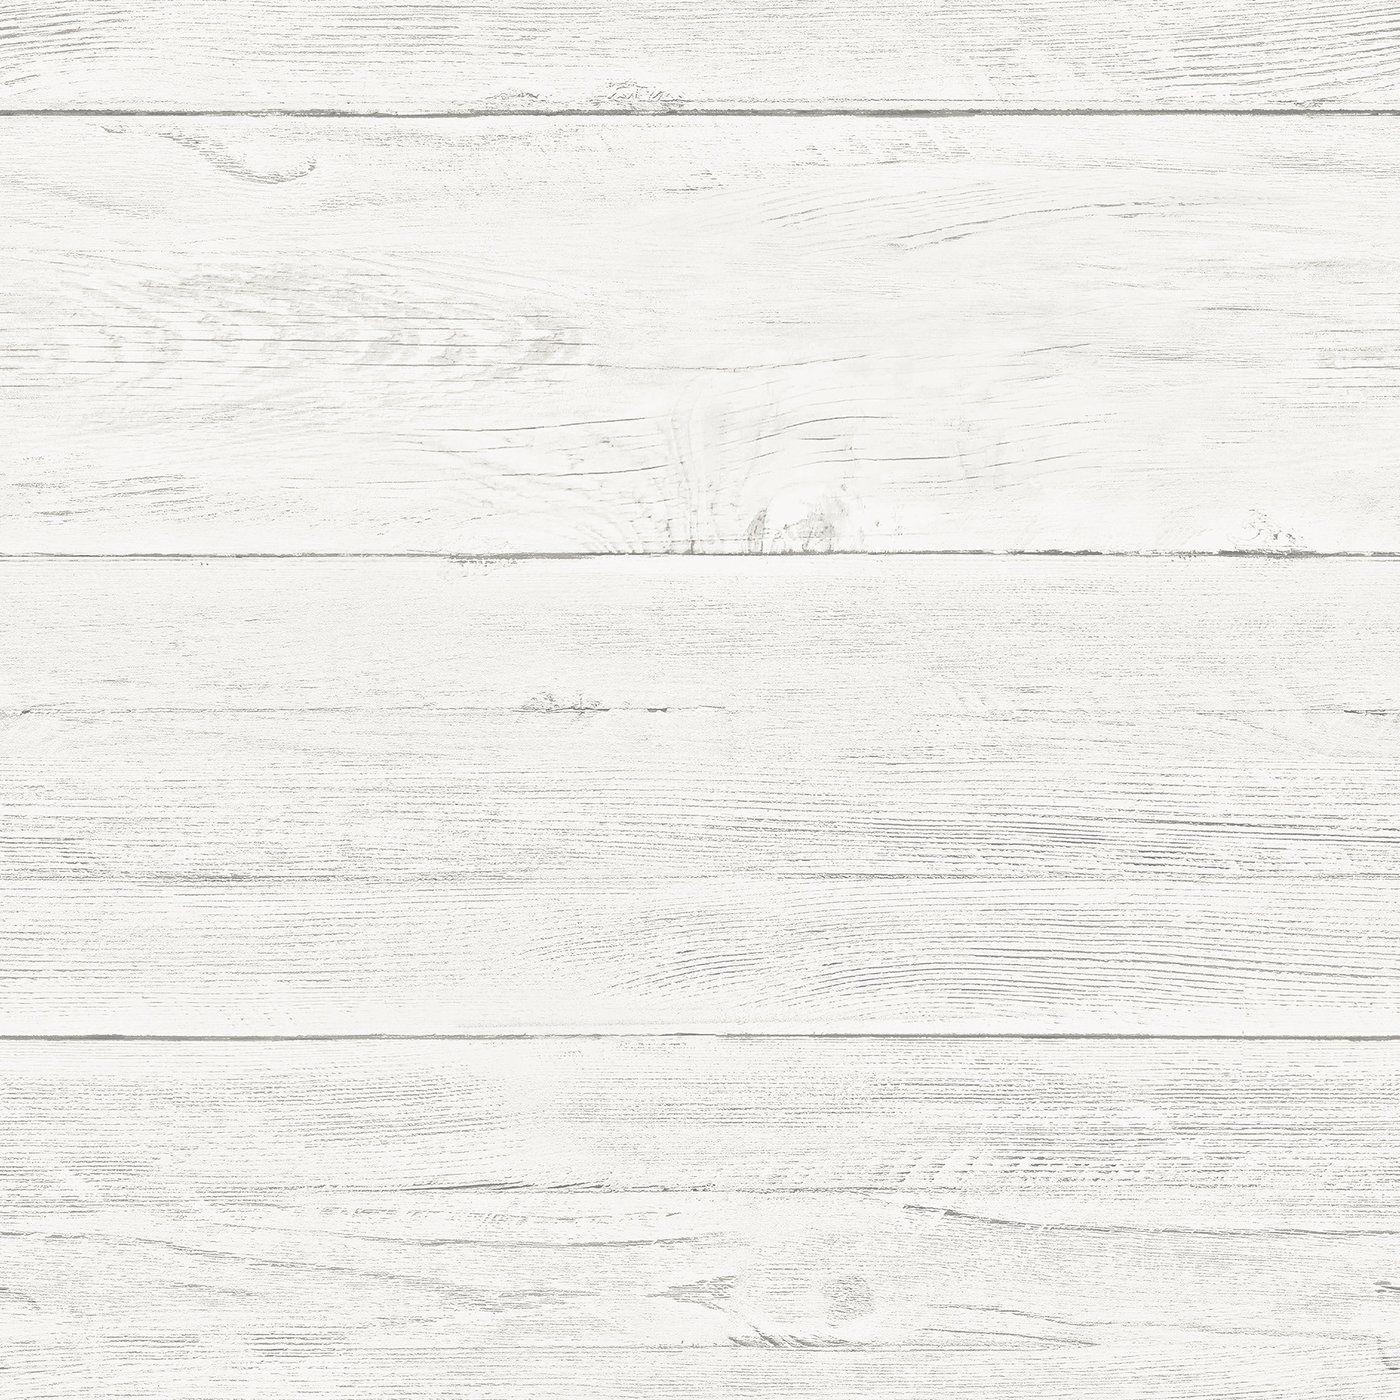 WallPops Shiplap Reclaimed Wood Peel and Stick Wallpaper